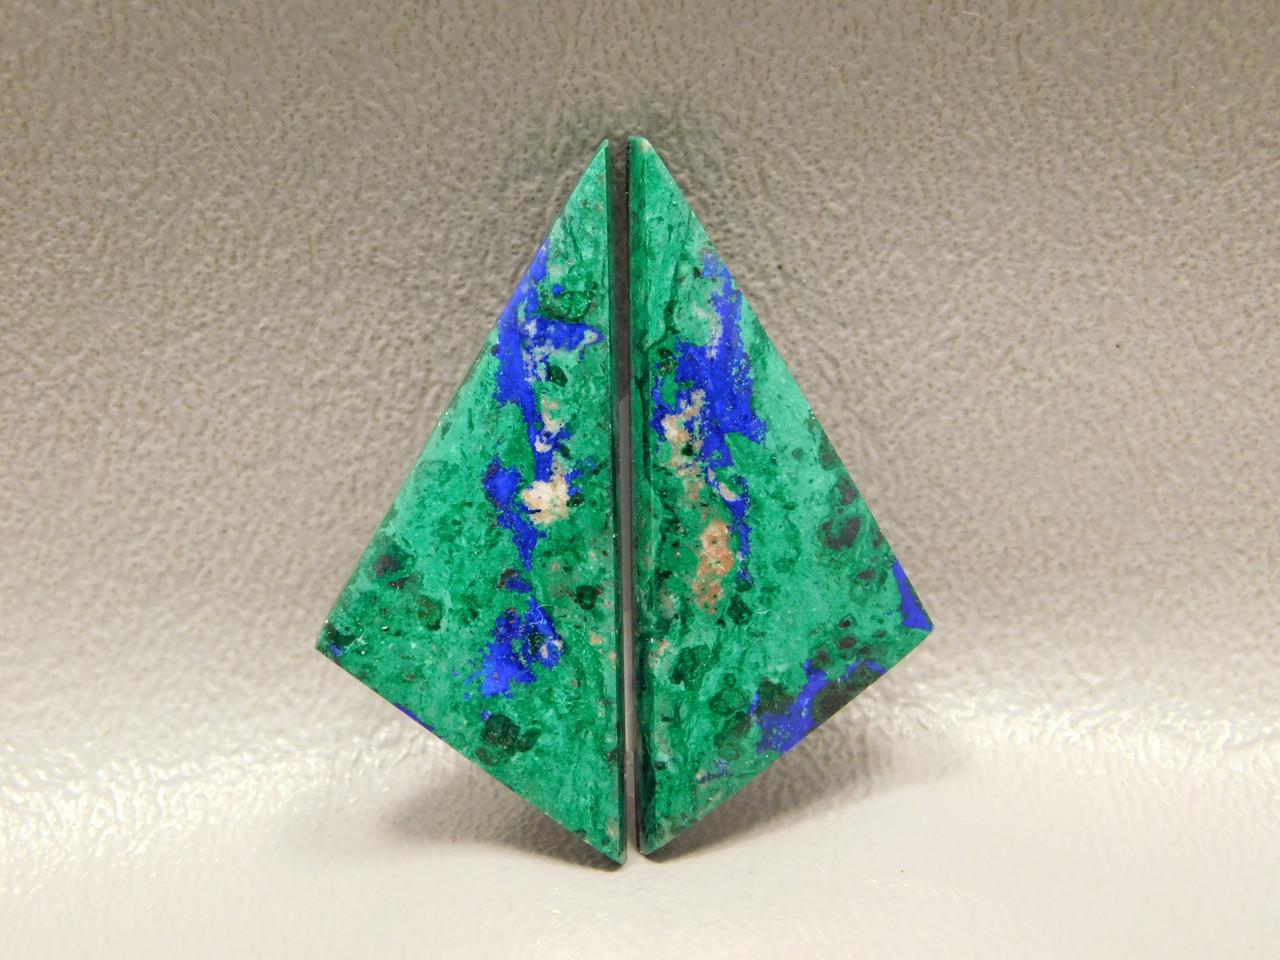 Azurite-Malachite Matched Pairs Cabochons Triangle Stones #33